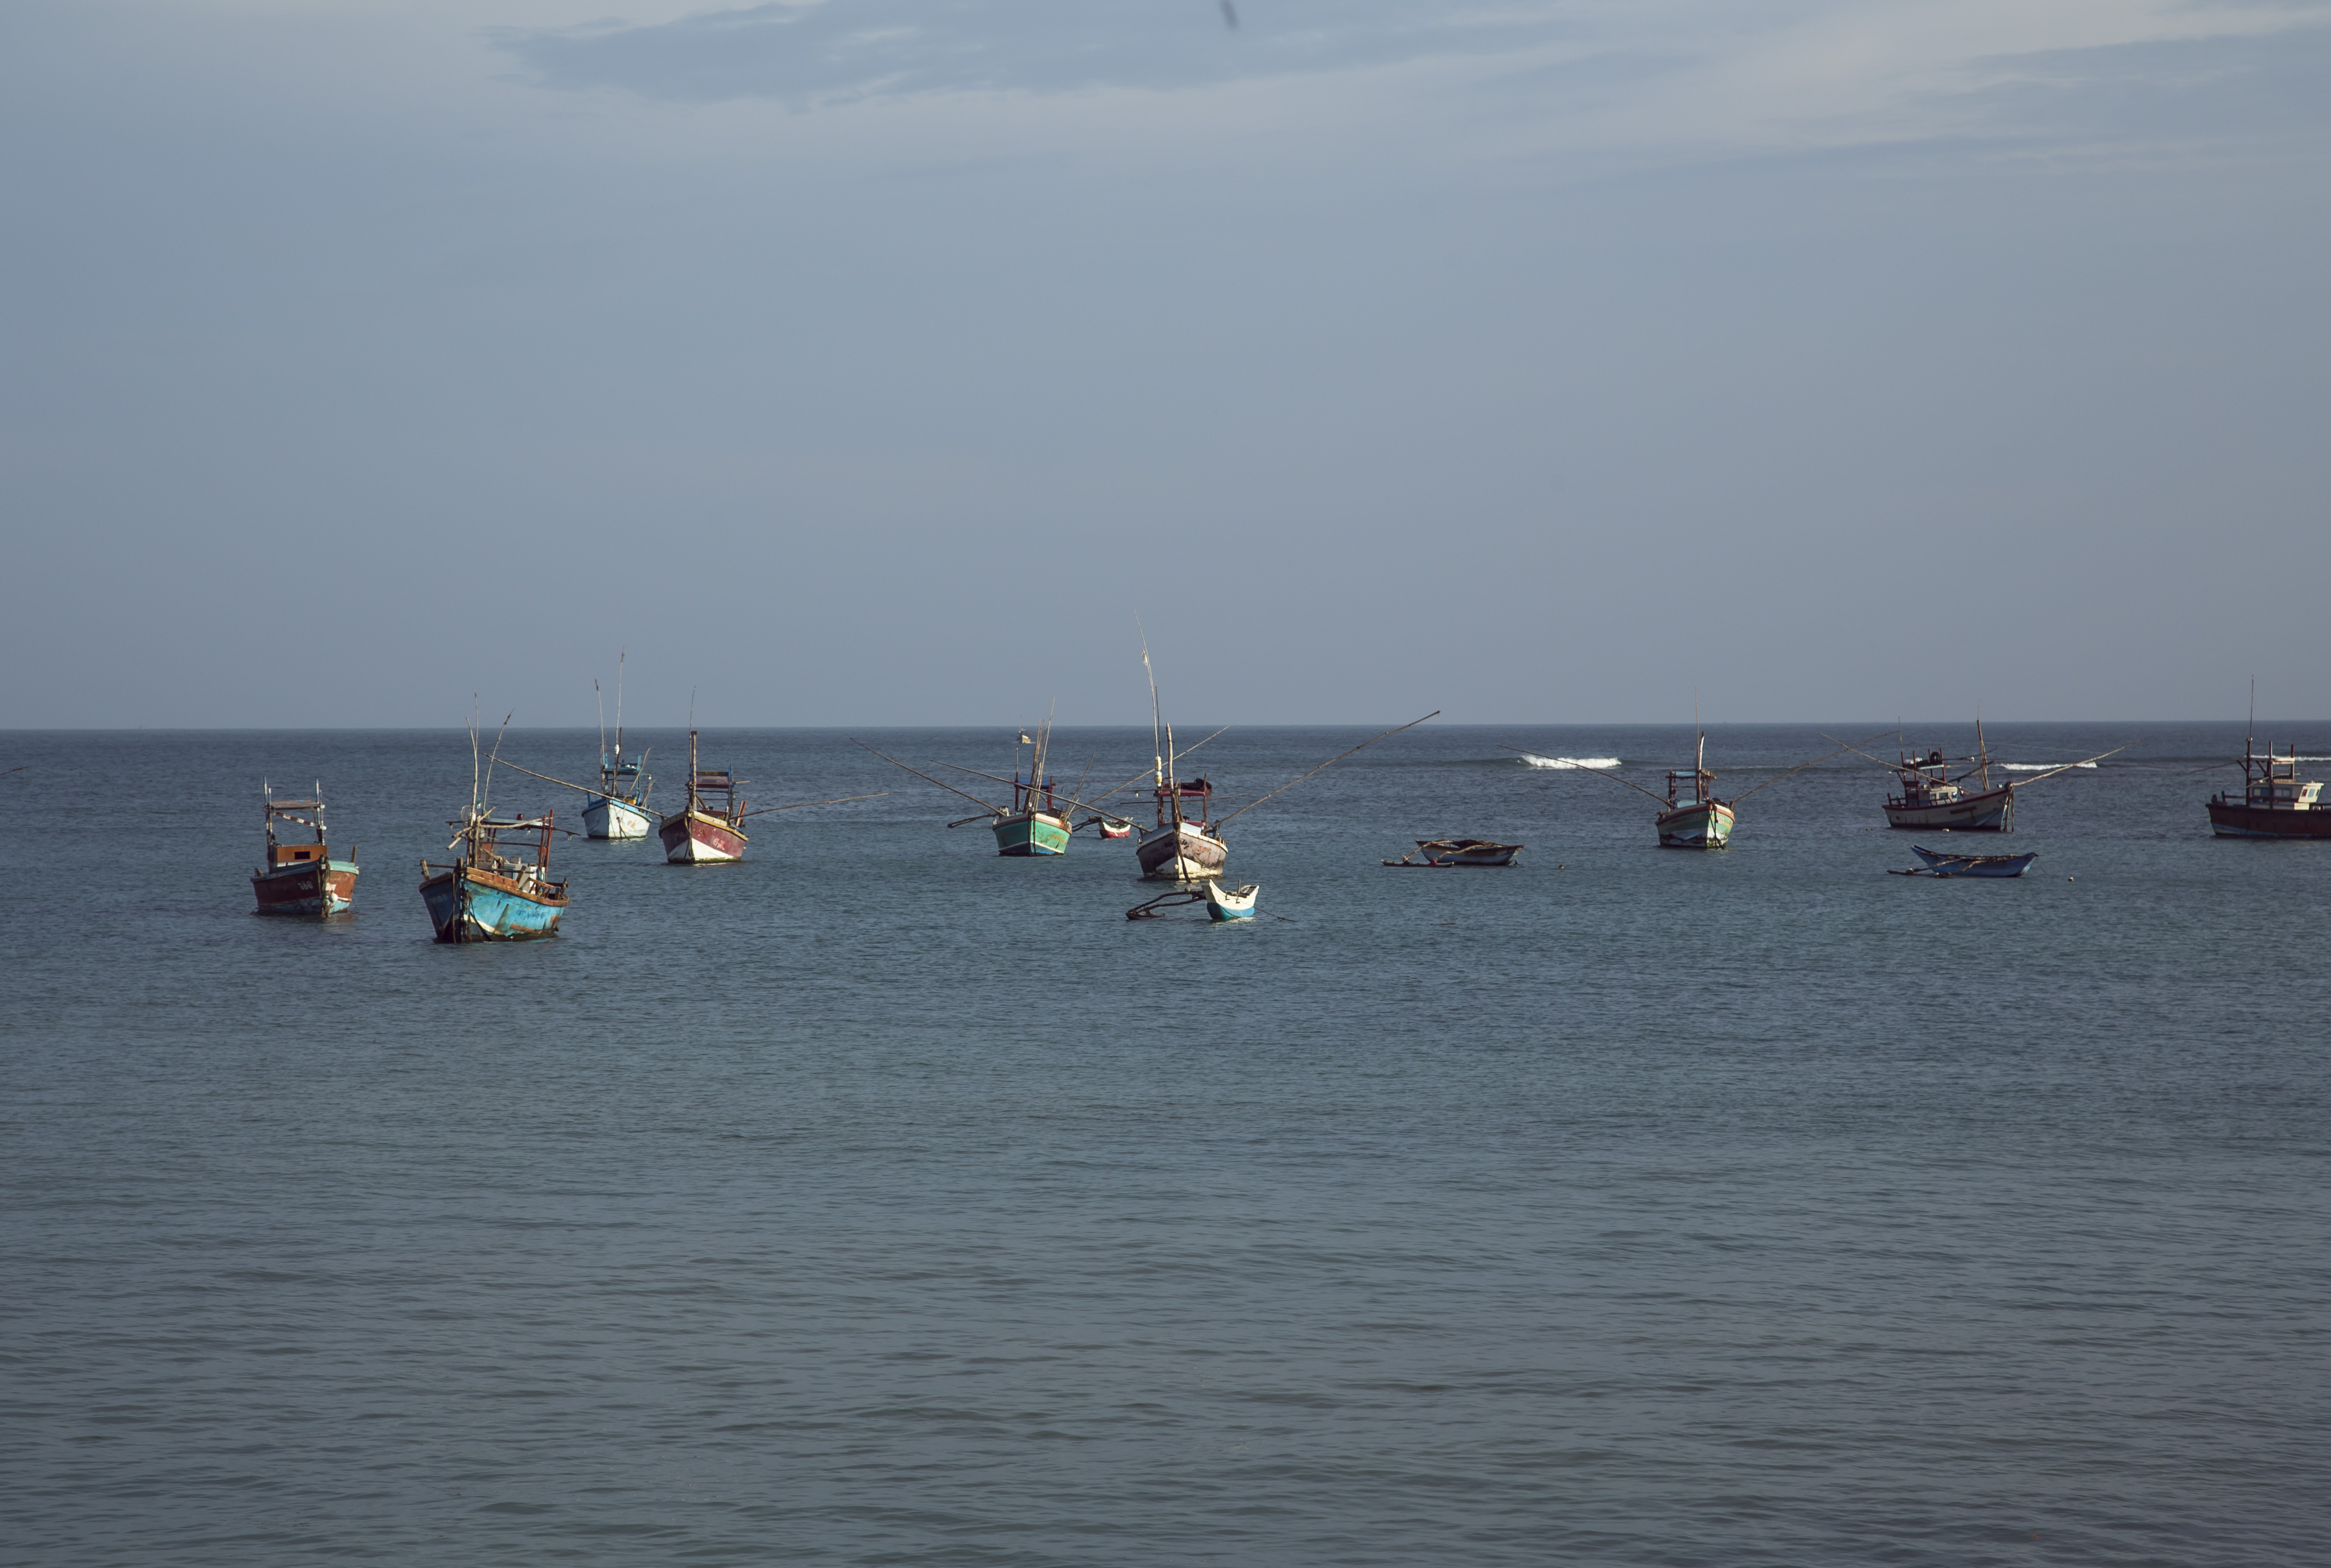 Boats on sea, Boats, Indian, Lanka, Ocean, HQ Photo